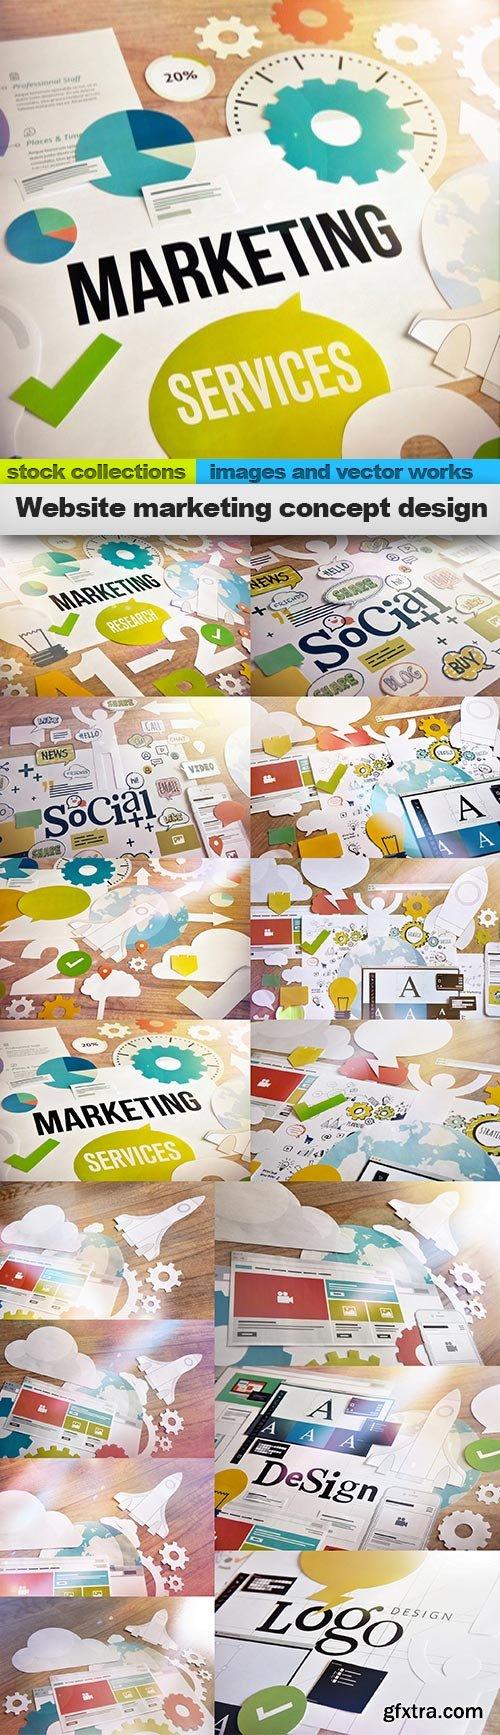 Website marketing concept design, 15 x UHQ JPEG